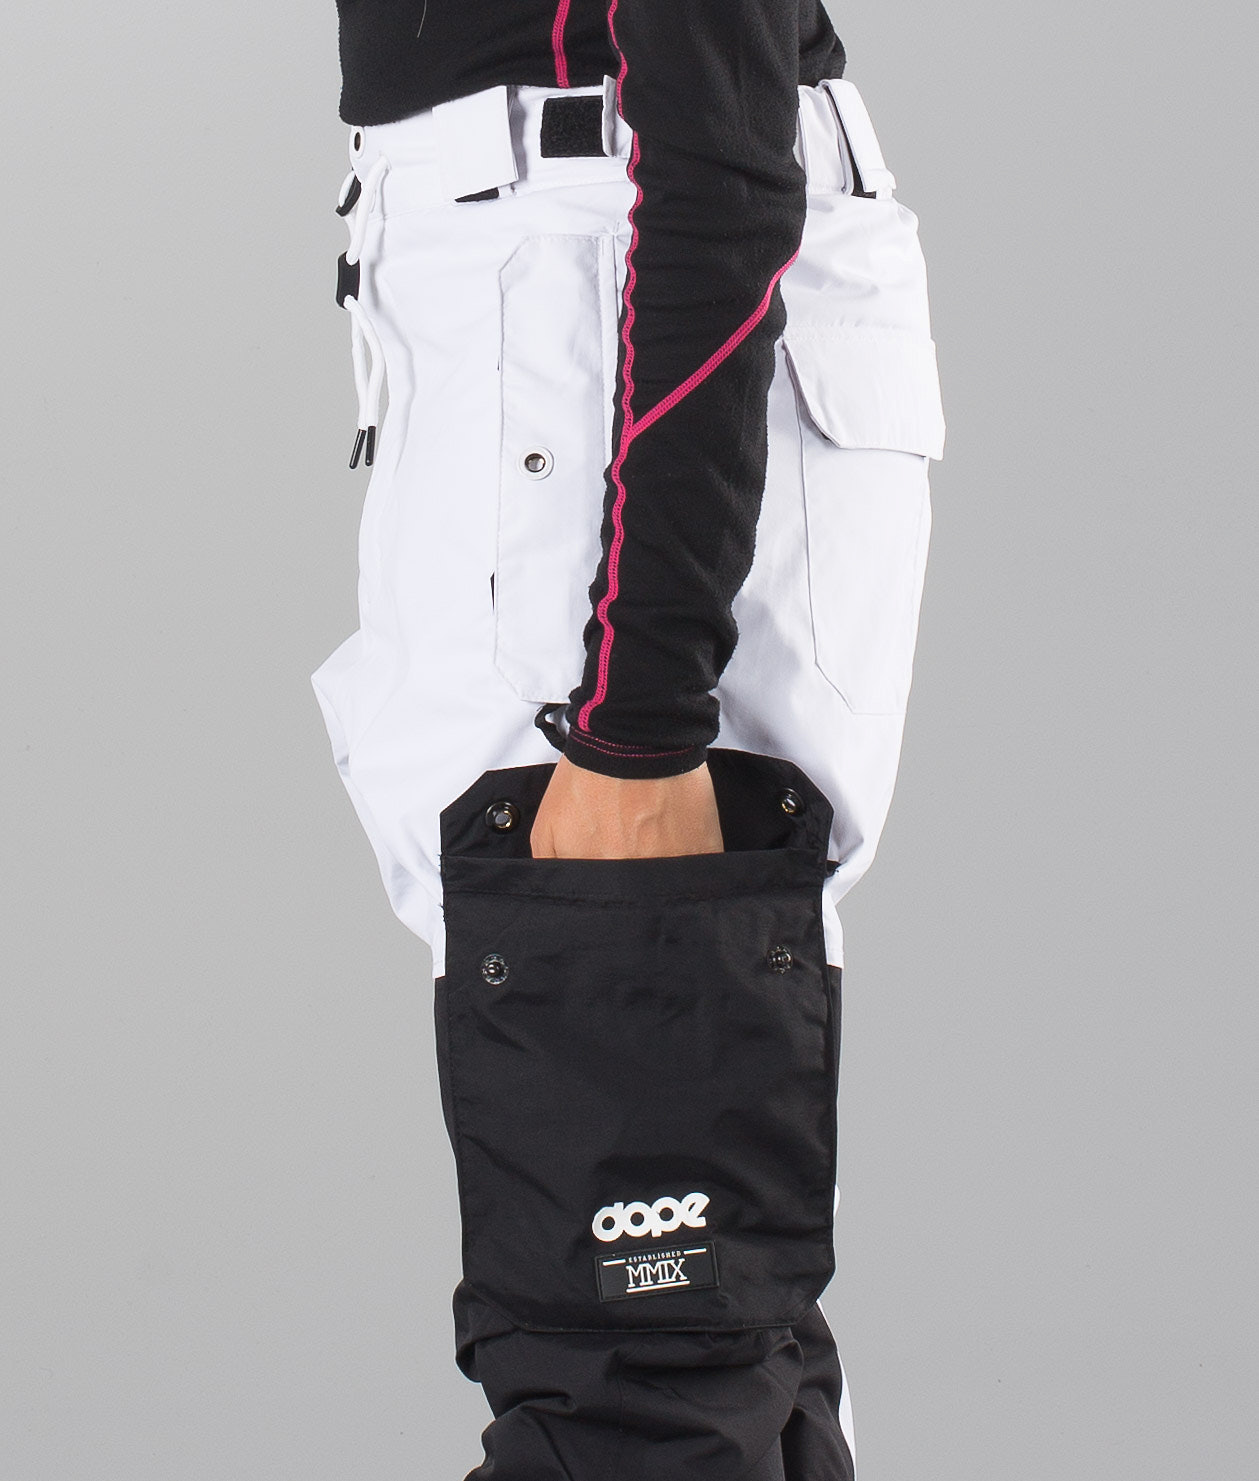 4eb1d928f7 Dope Adept Unisex Ski Pants Black White - Ridestore.com